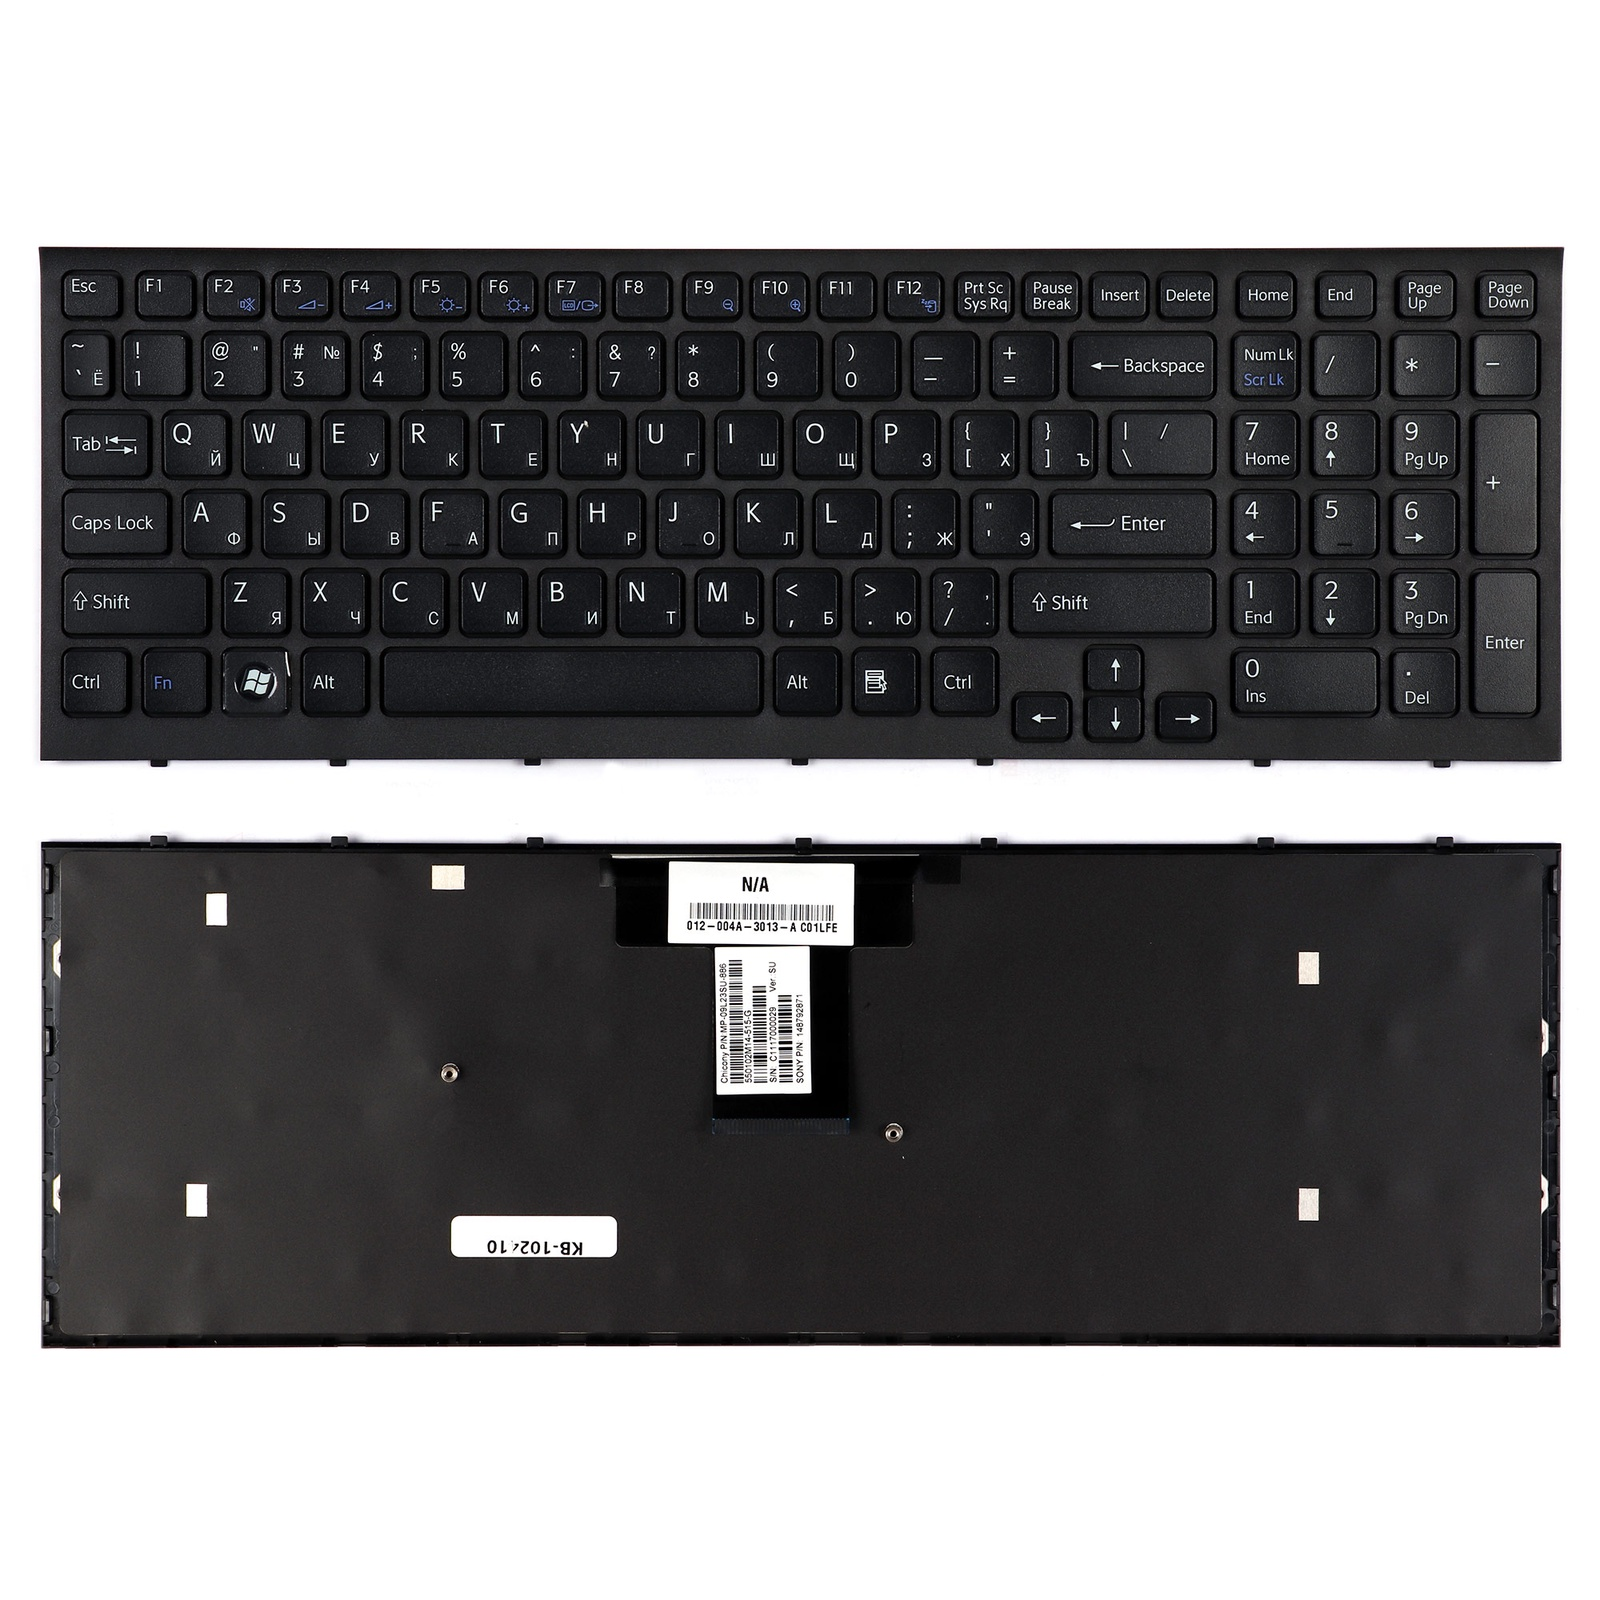 Клавиатура TopOn Sony VPC-EB, PCG-71211 Series. Плоский Enter. С рамкой. PN: 148792871, V111678A, 550102M14-203-G., KB-102410, черный клавиатура 1200 nokia